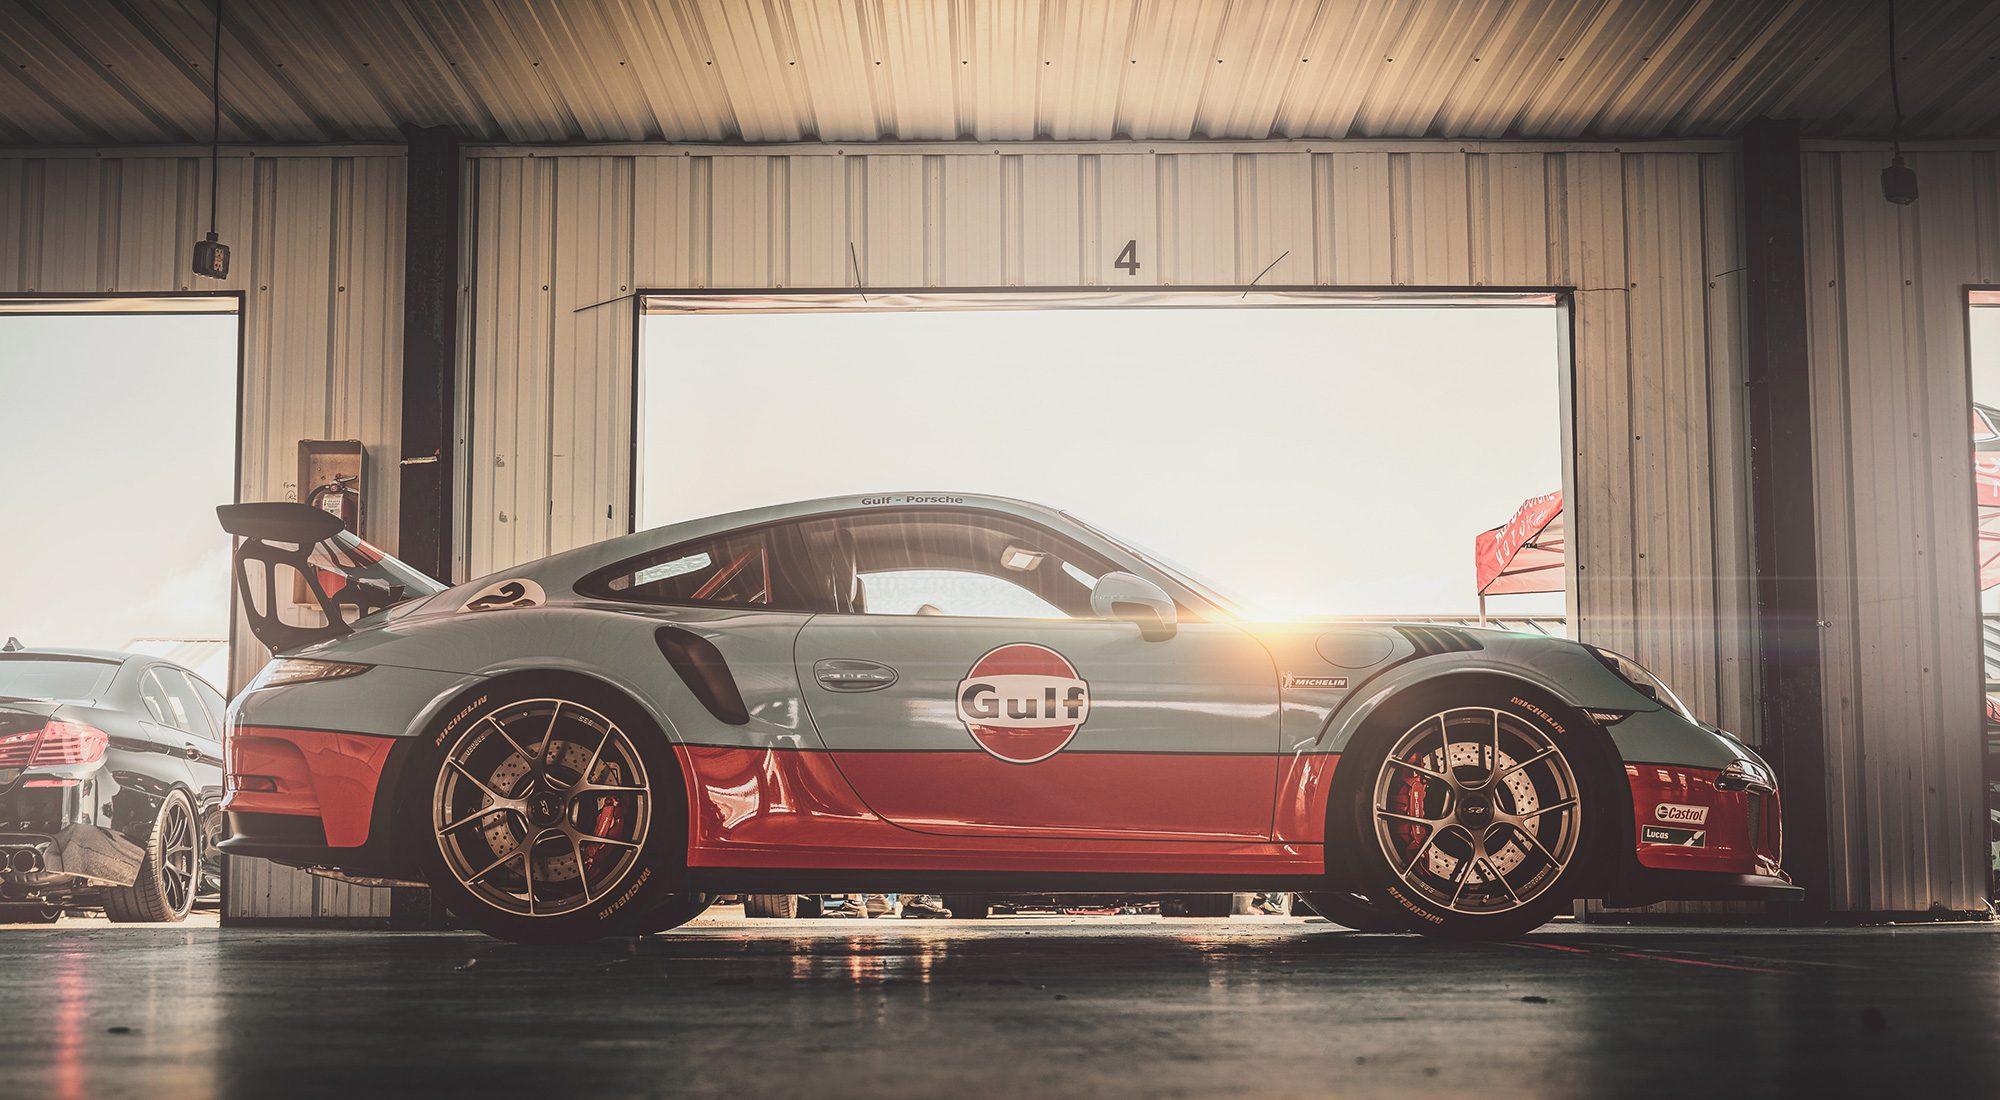 Tutorial: 4 Rules for Adding Lens Flair – Gulf Porsche 911 GT3